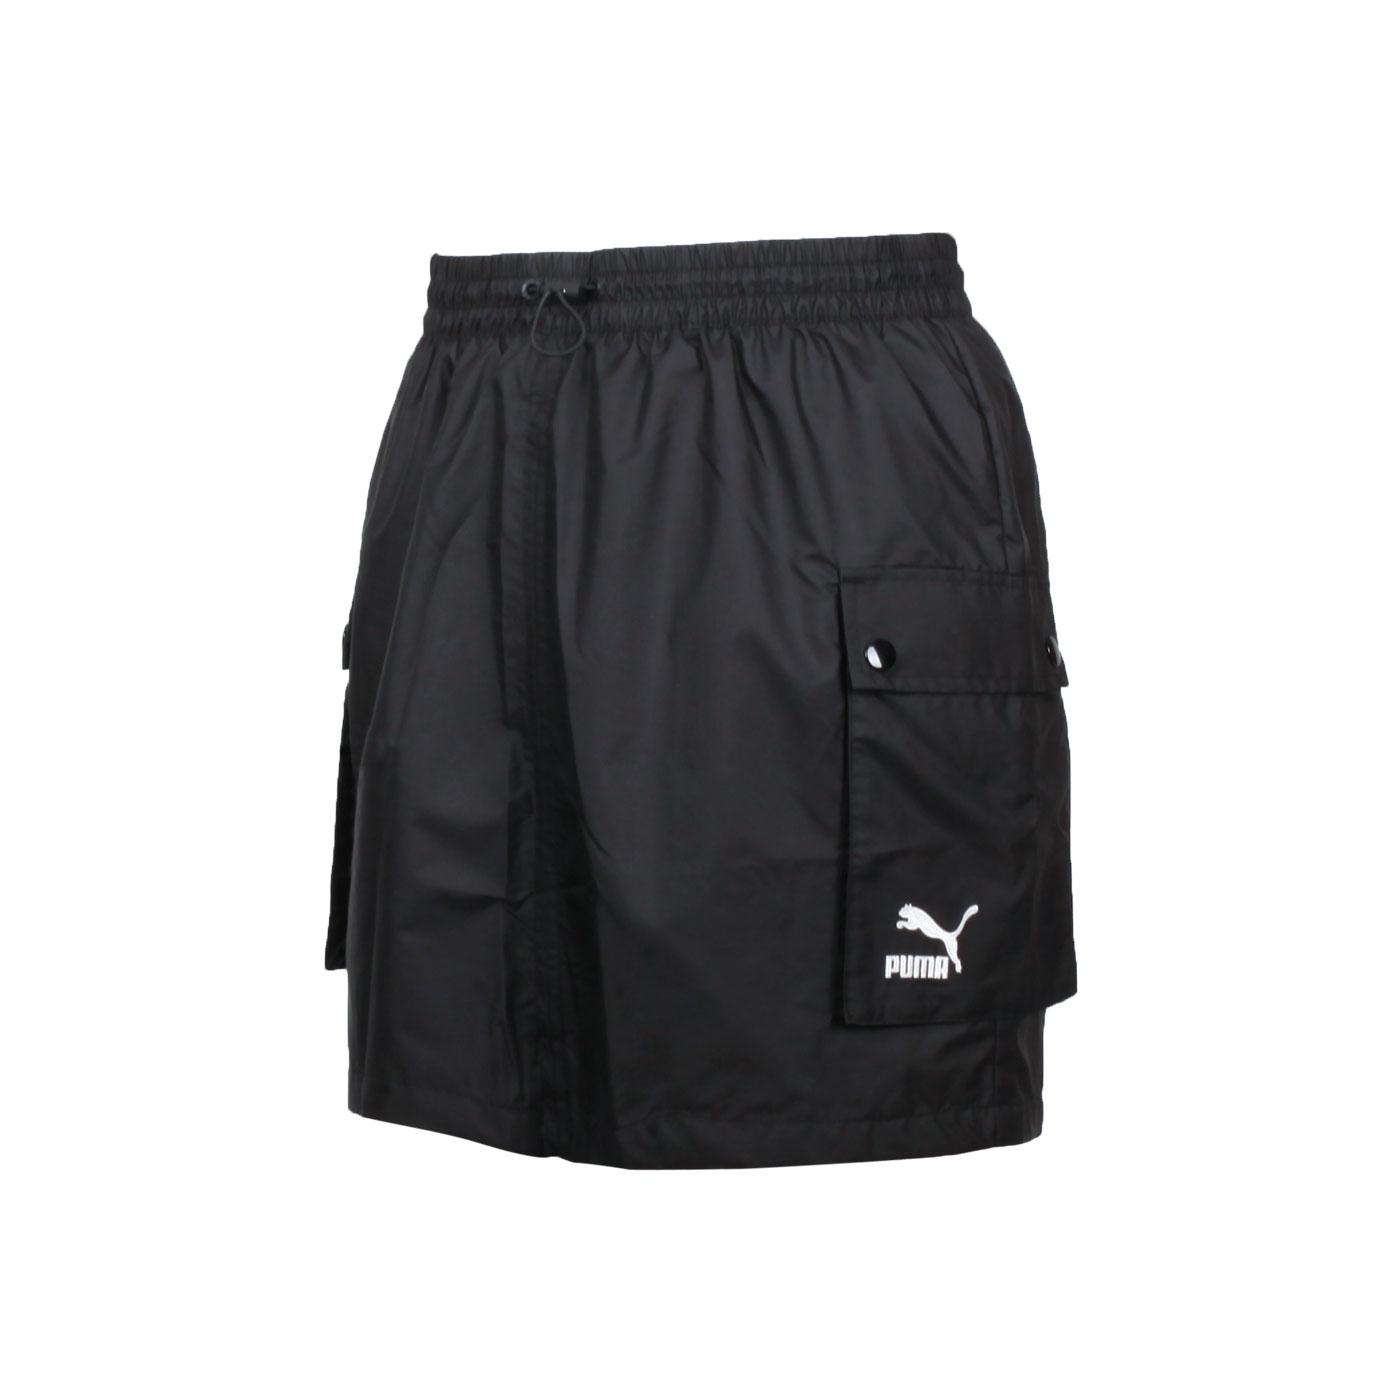 PUMA 女款Classics工業風短風裙 53022601 - 黑白